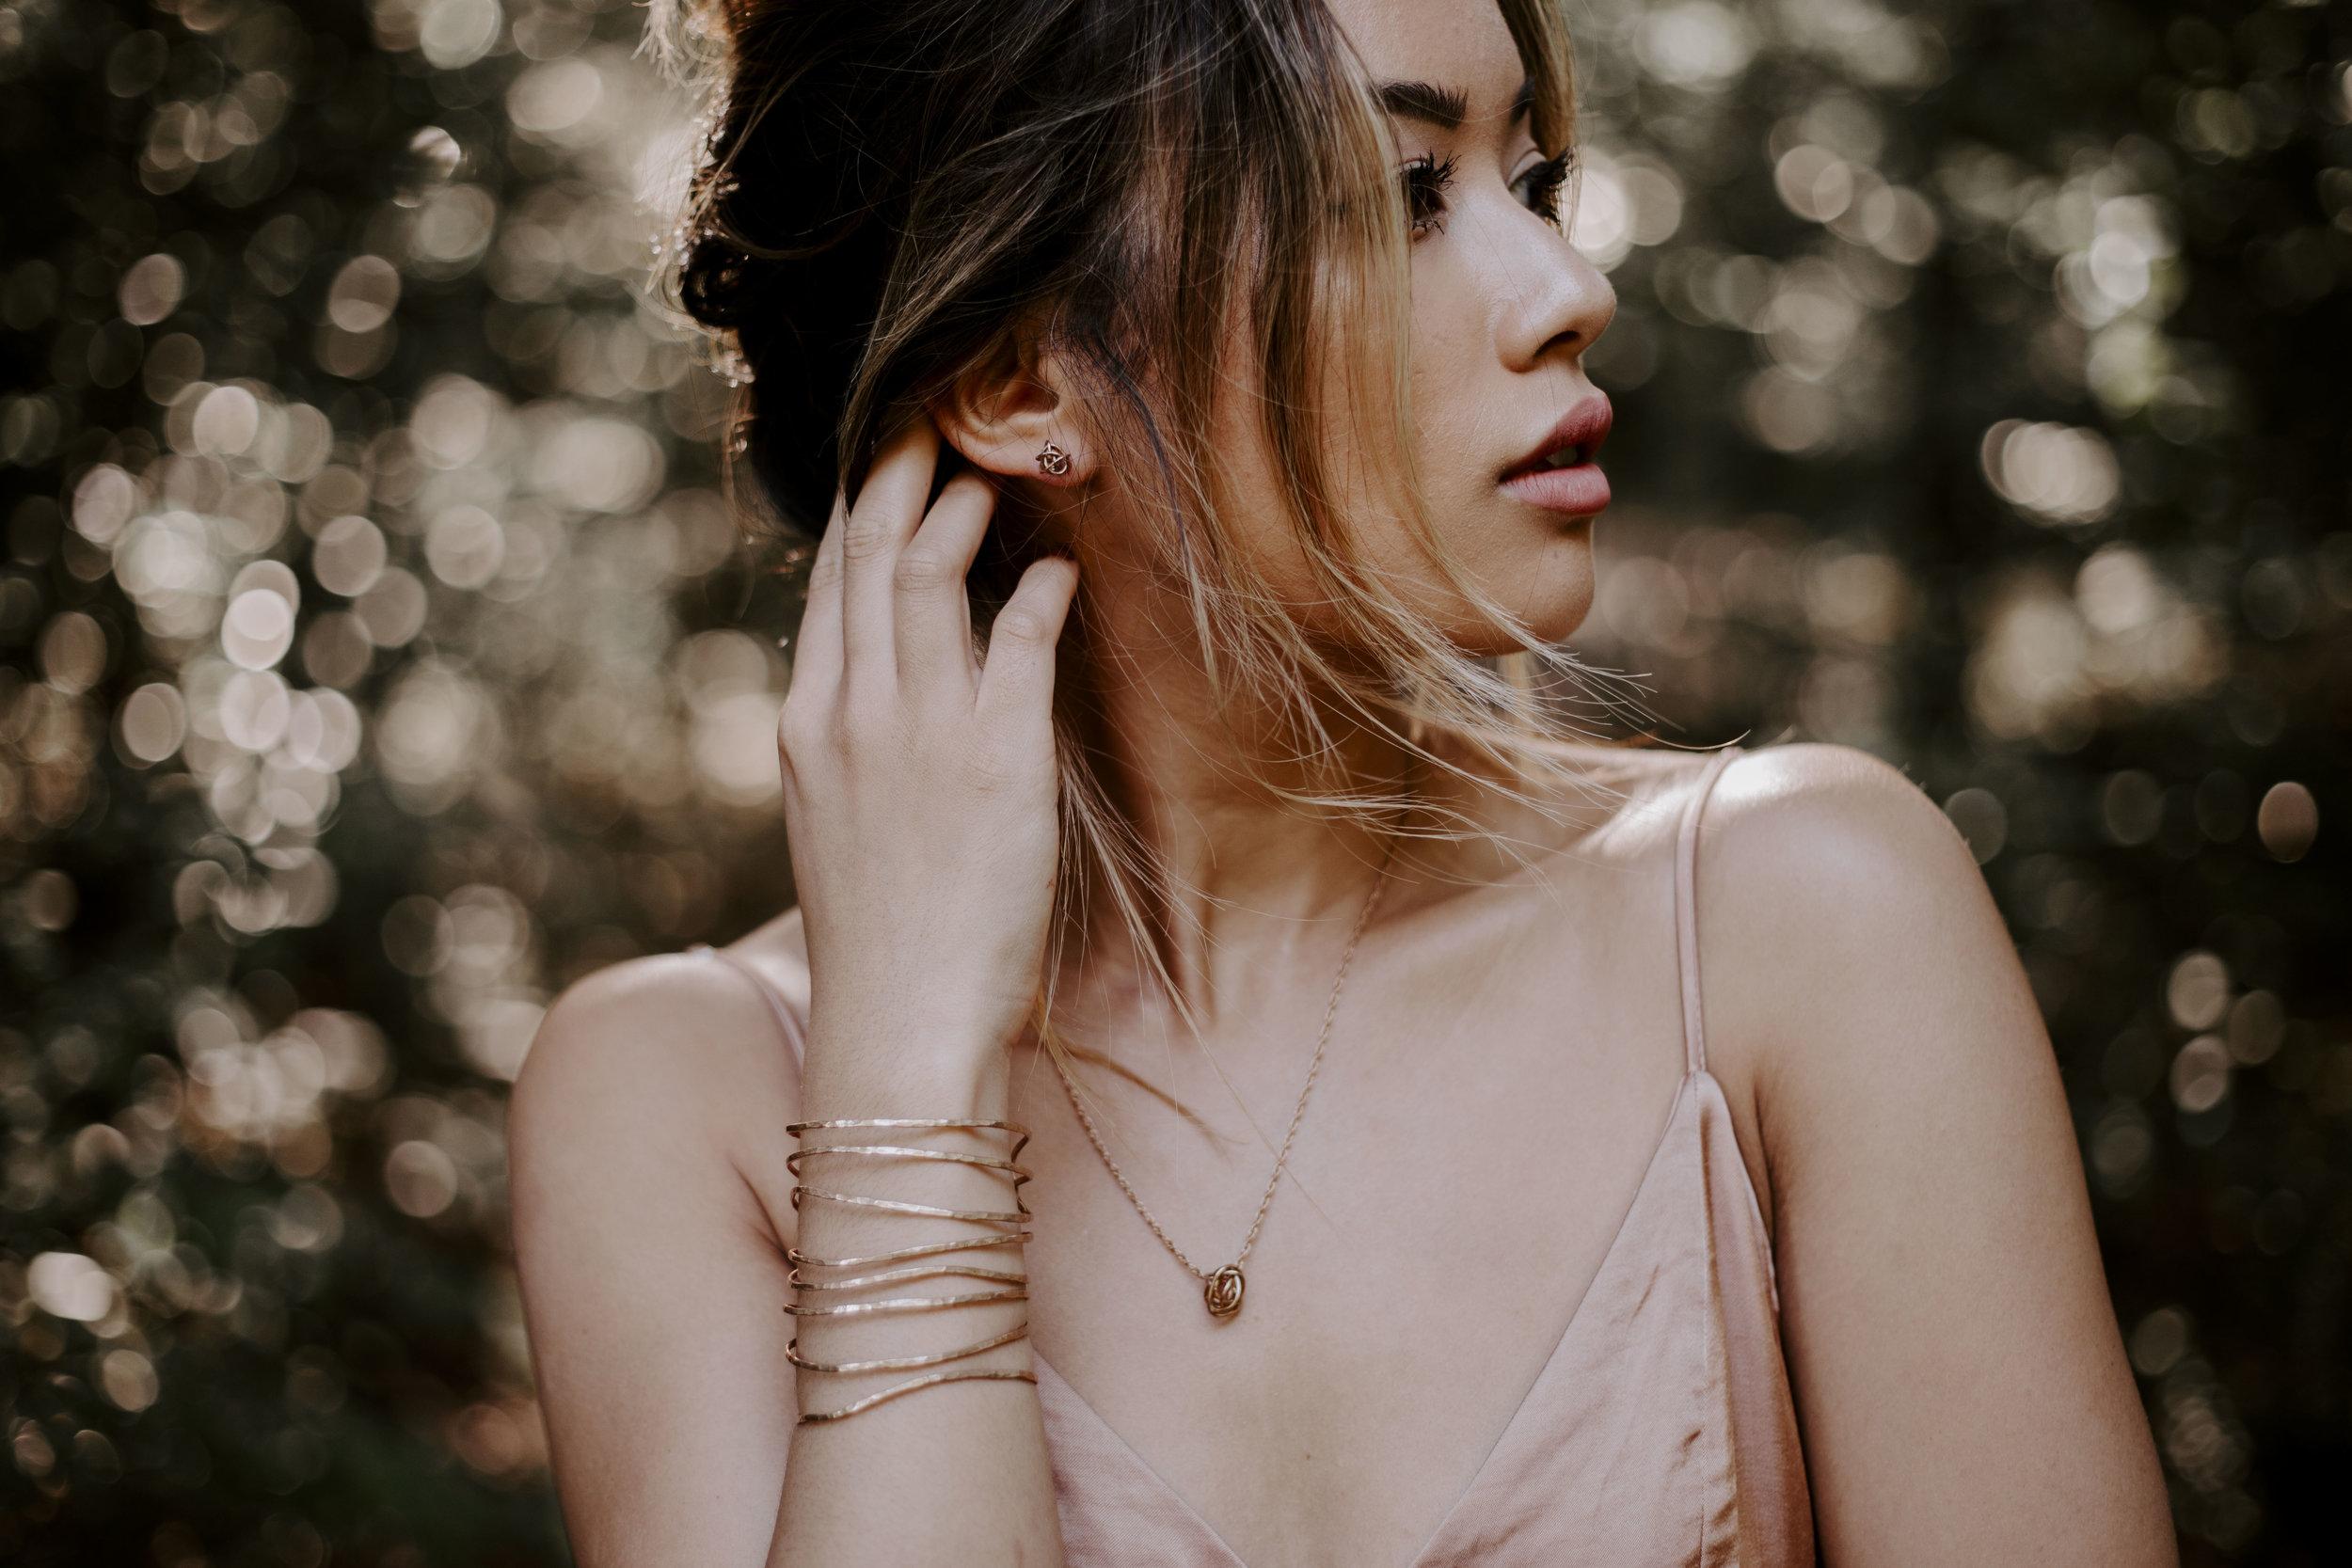 Bronze knot earrings & necklace, bronze linear cuff